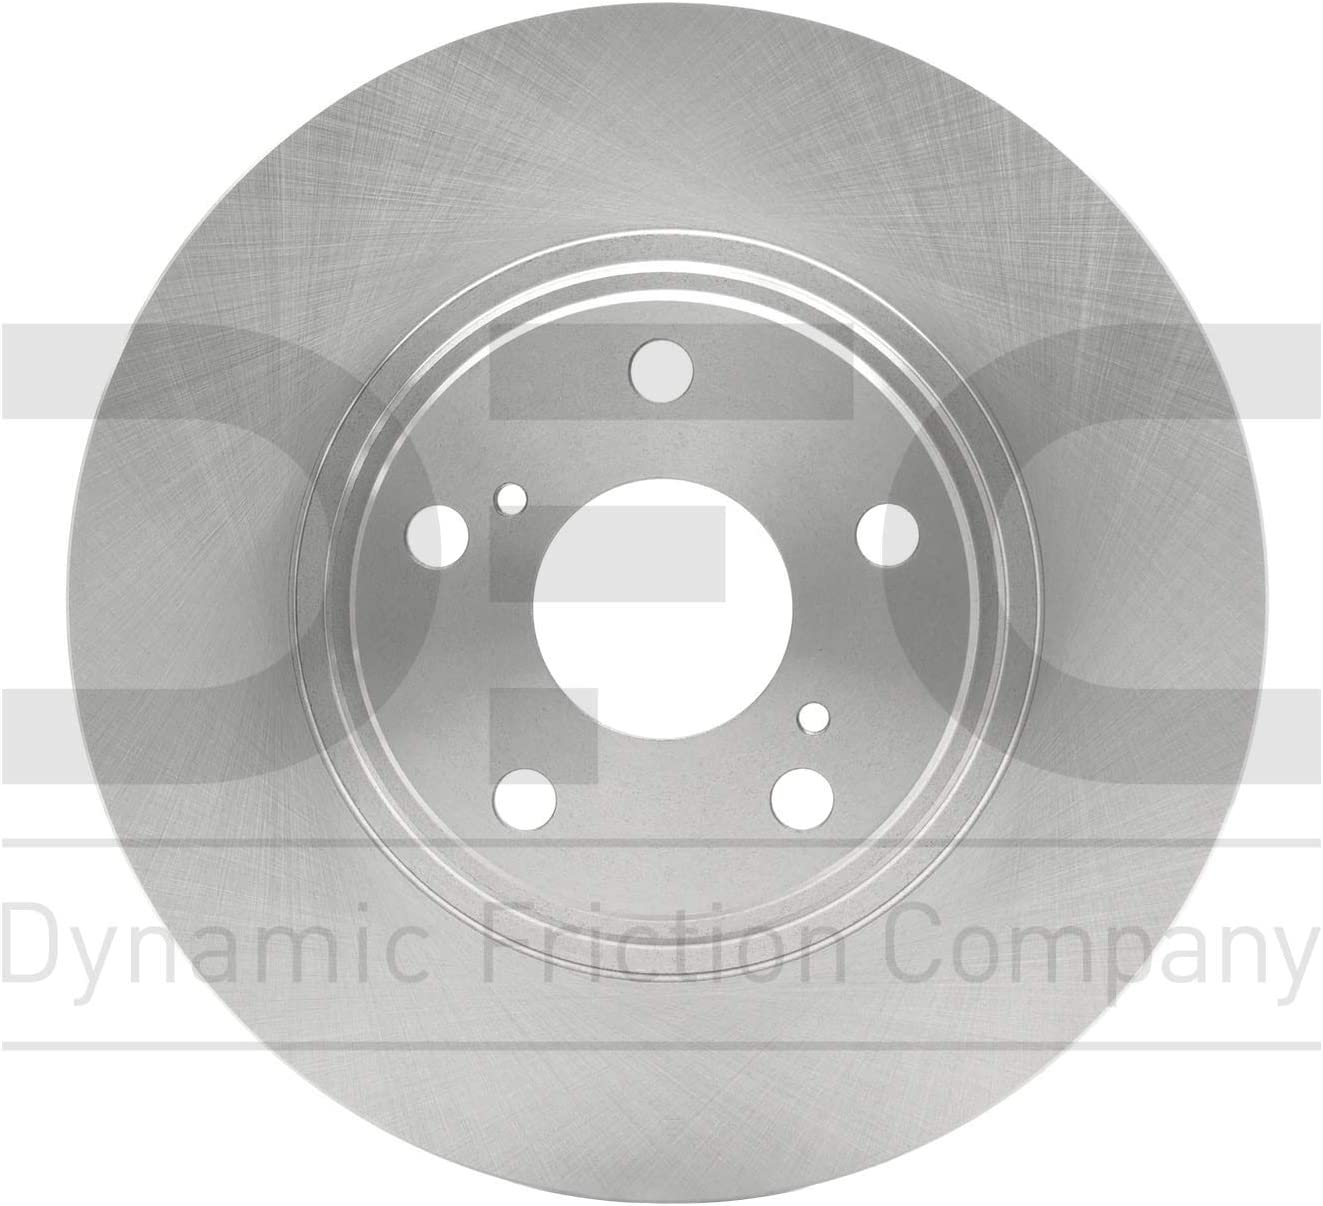 Front Easy-to-use Dynamic Friction Company Disc 600-76055 1 Rotor Philadelphia Mall Brake